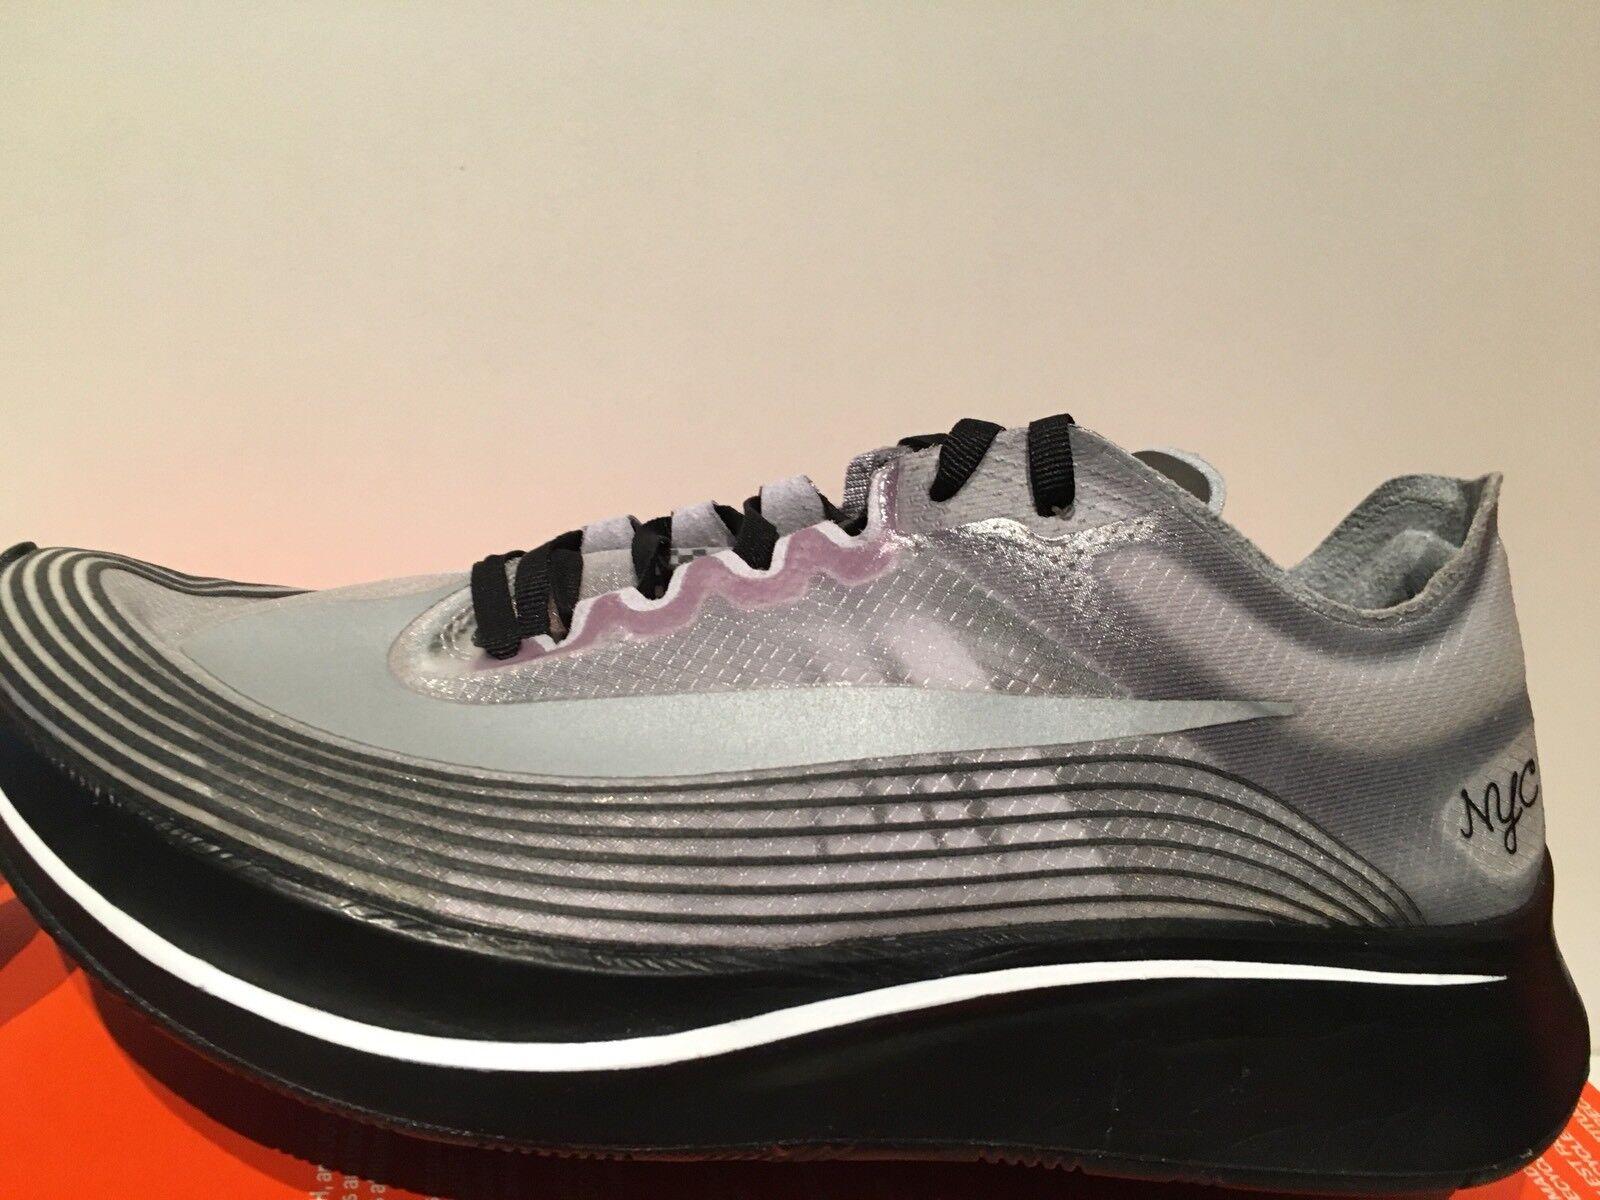 c8ebeb5d31bd ... Nike NikeLab Zoom Fly NYC New New New York City Marathon Black White  Size 8.5 AH5088 ...